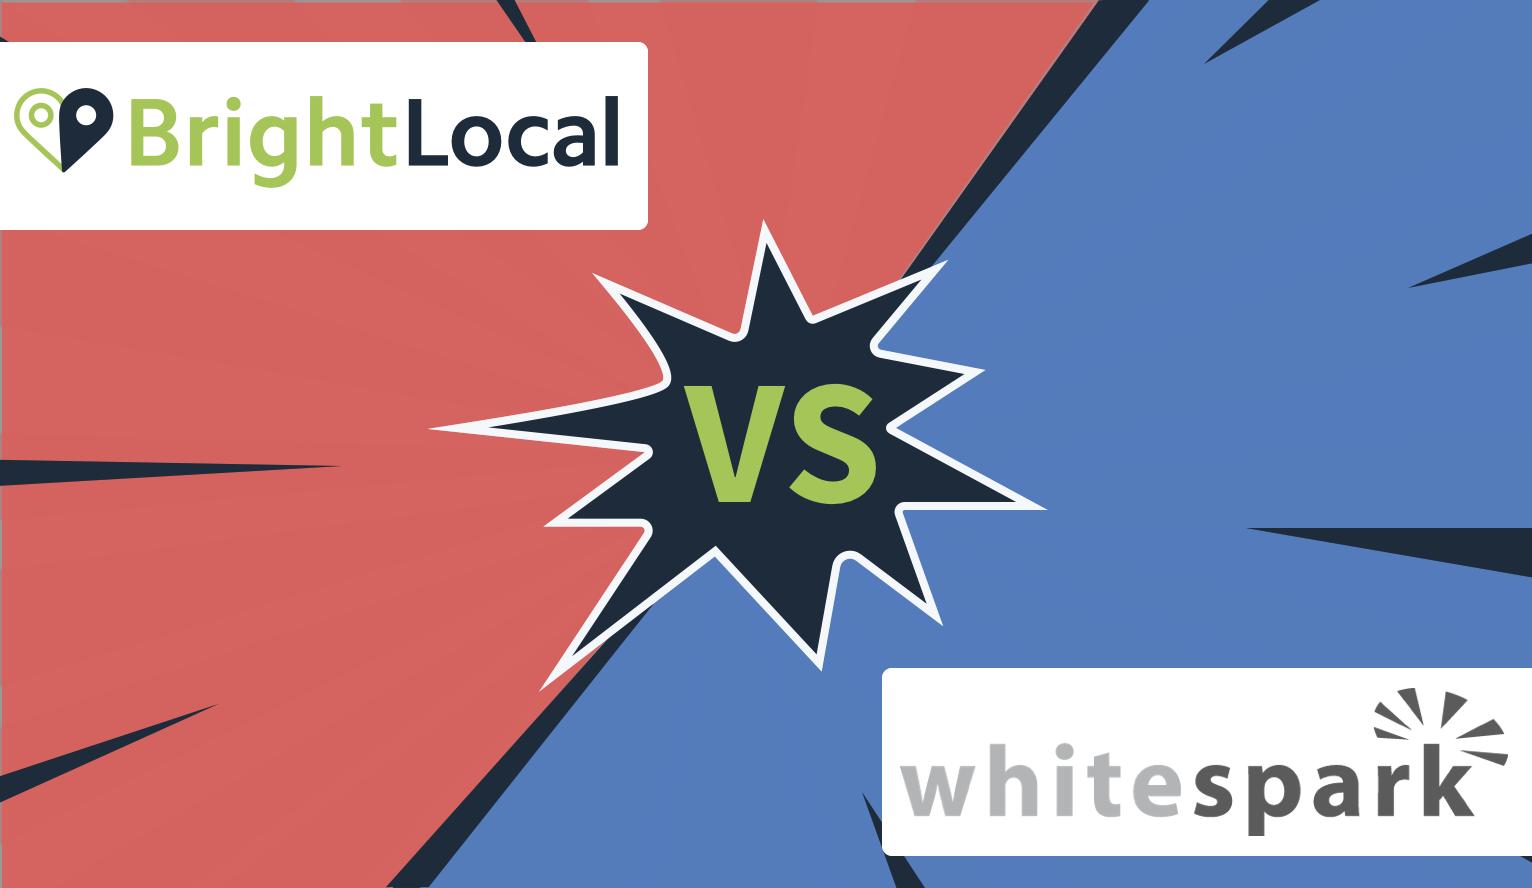 BrightLocal vs Whitespark